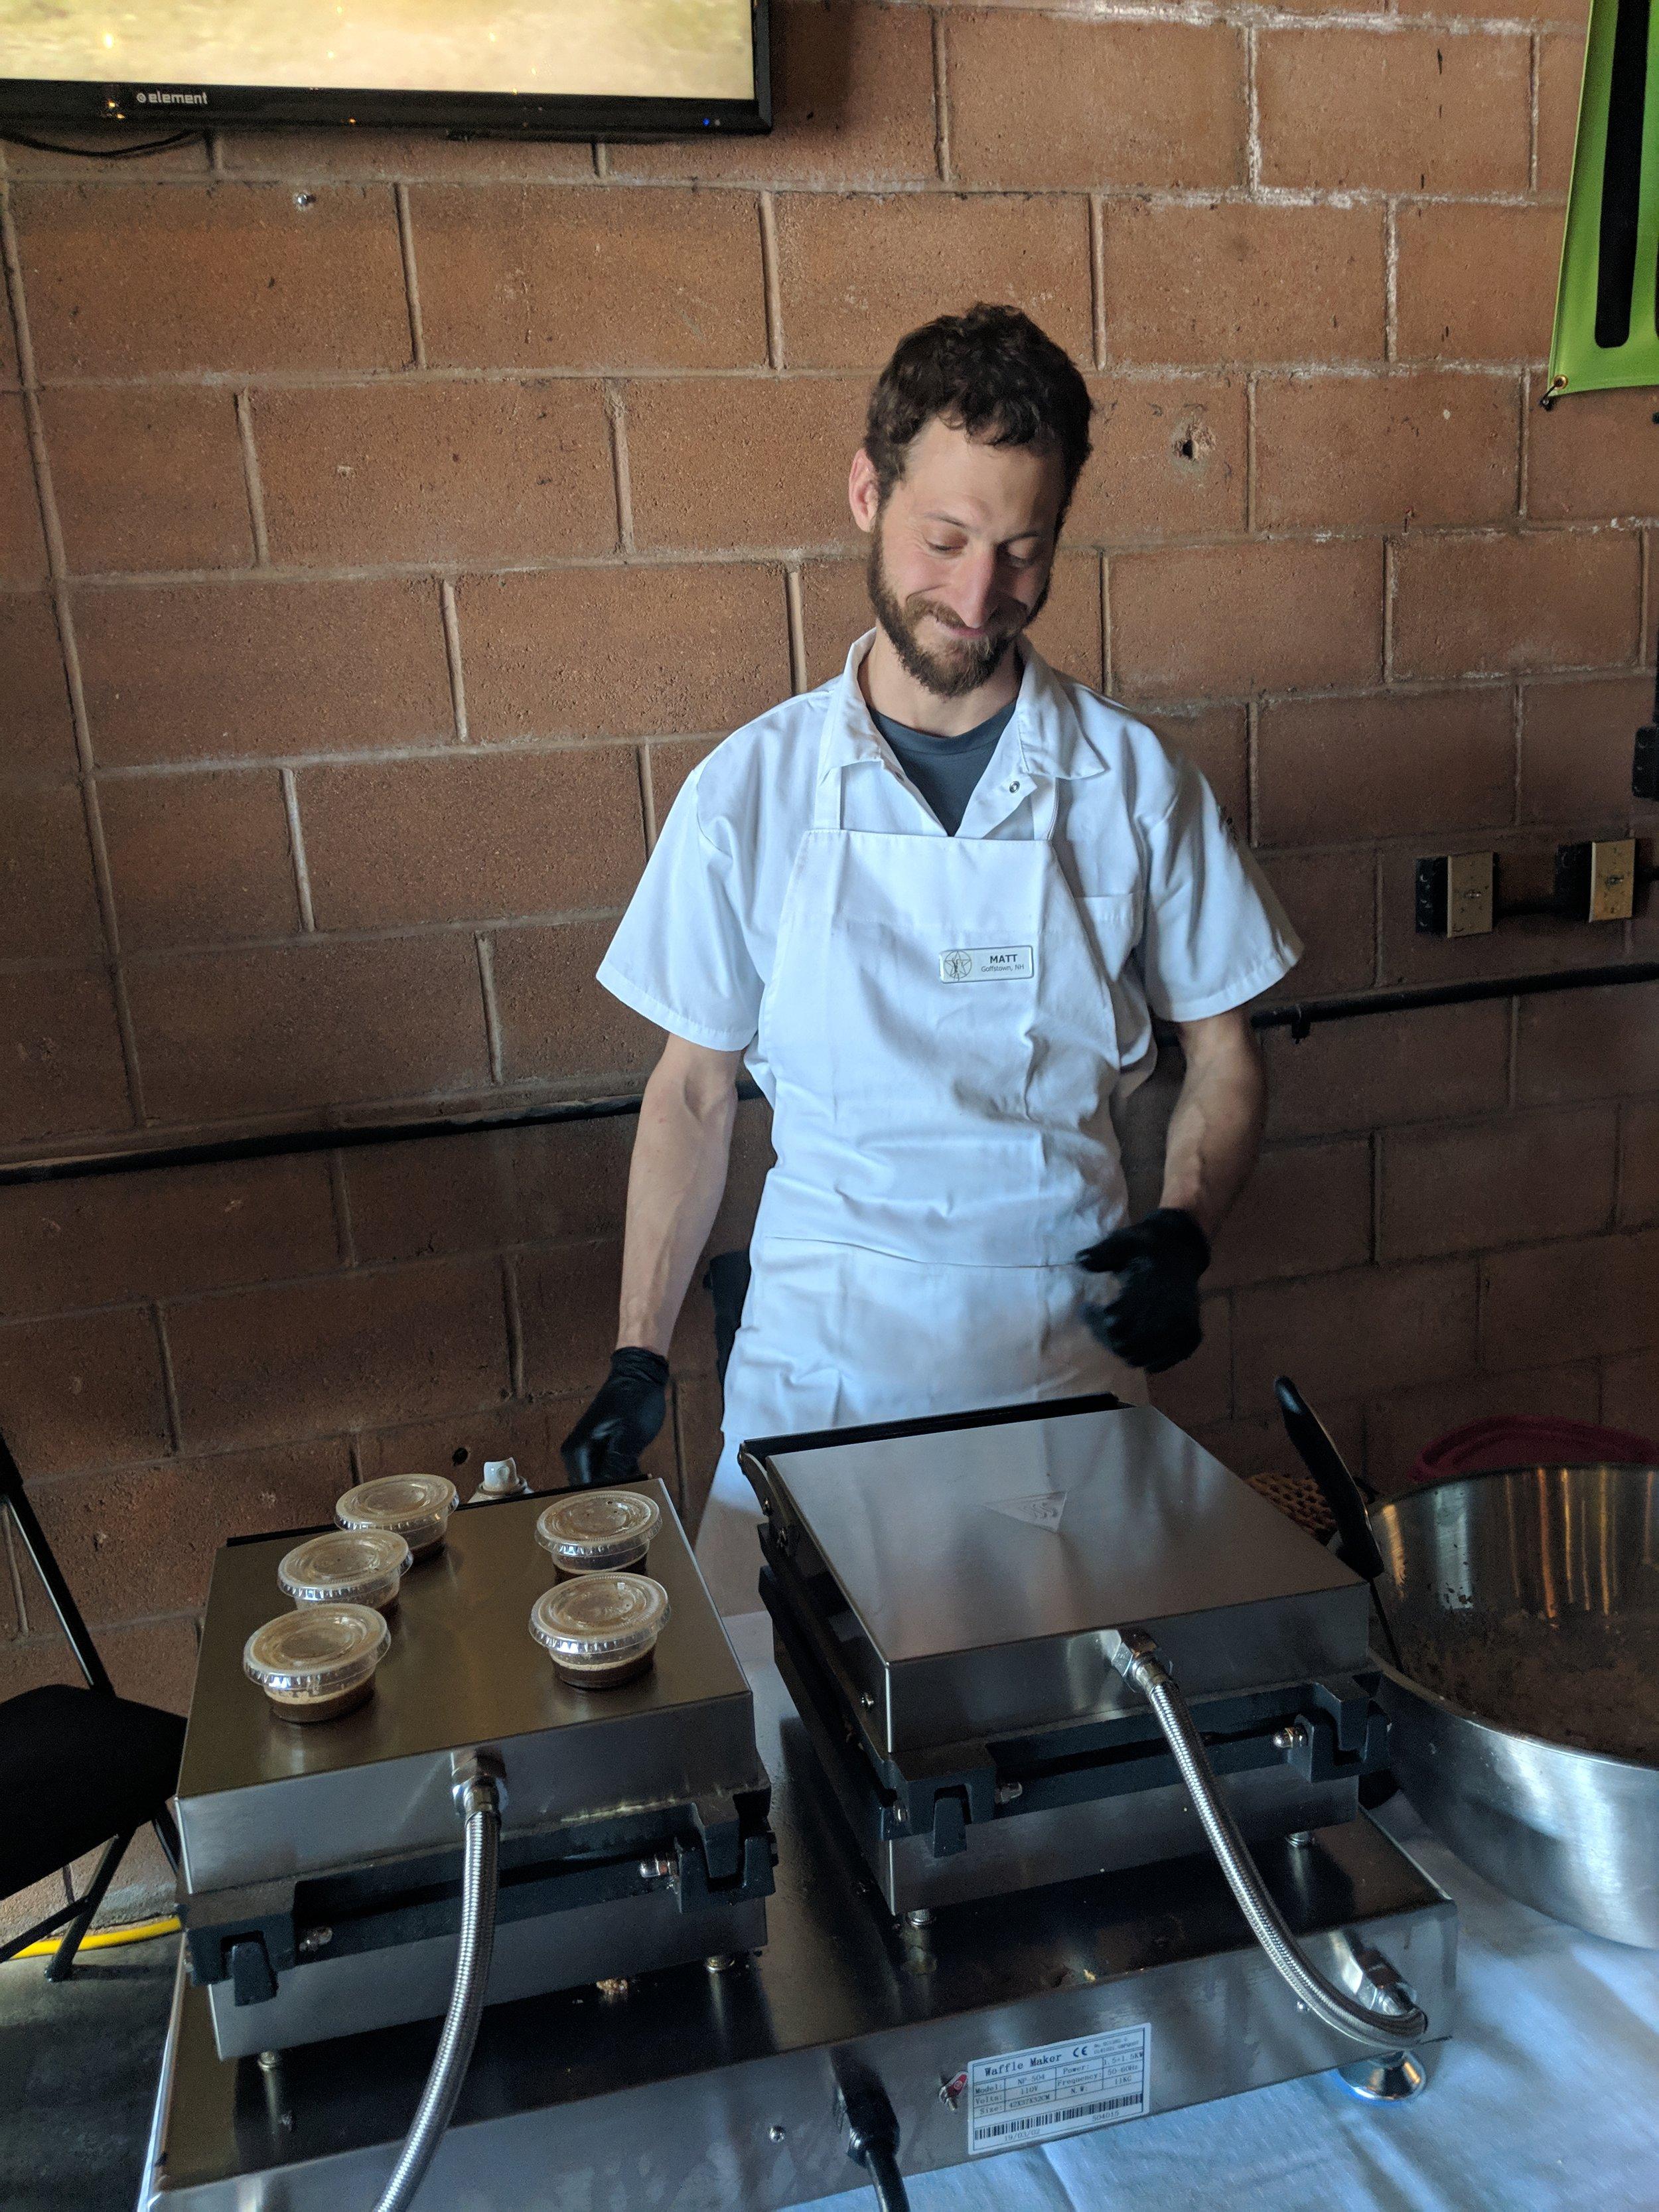 Matt had great fun making waffles today!